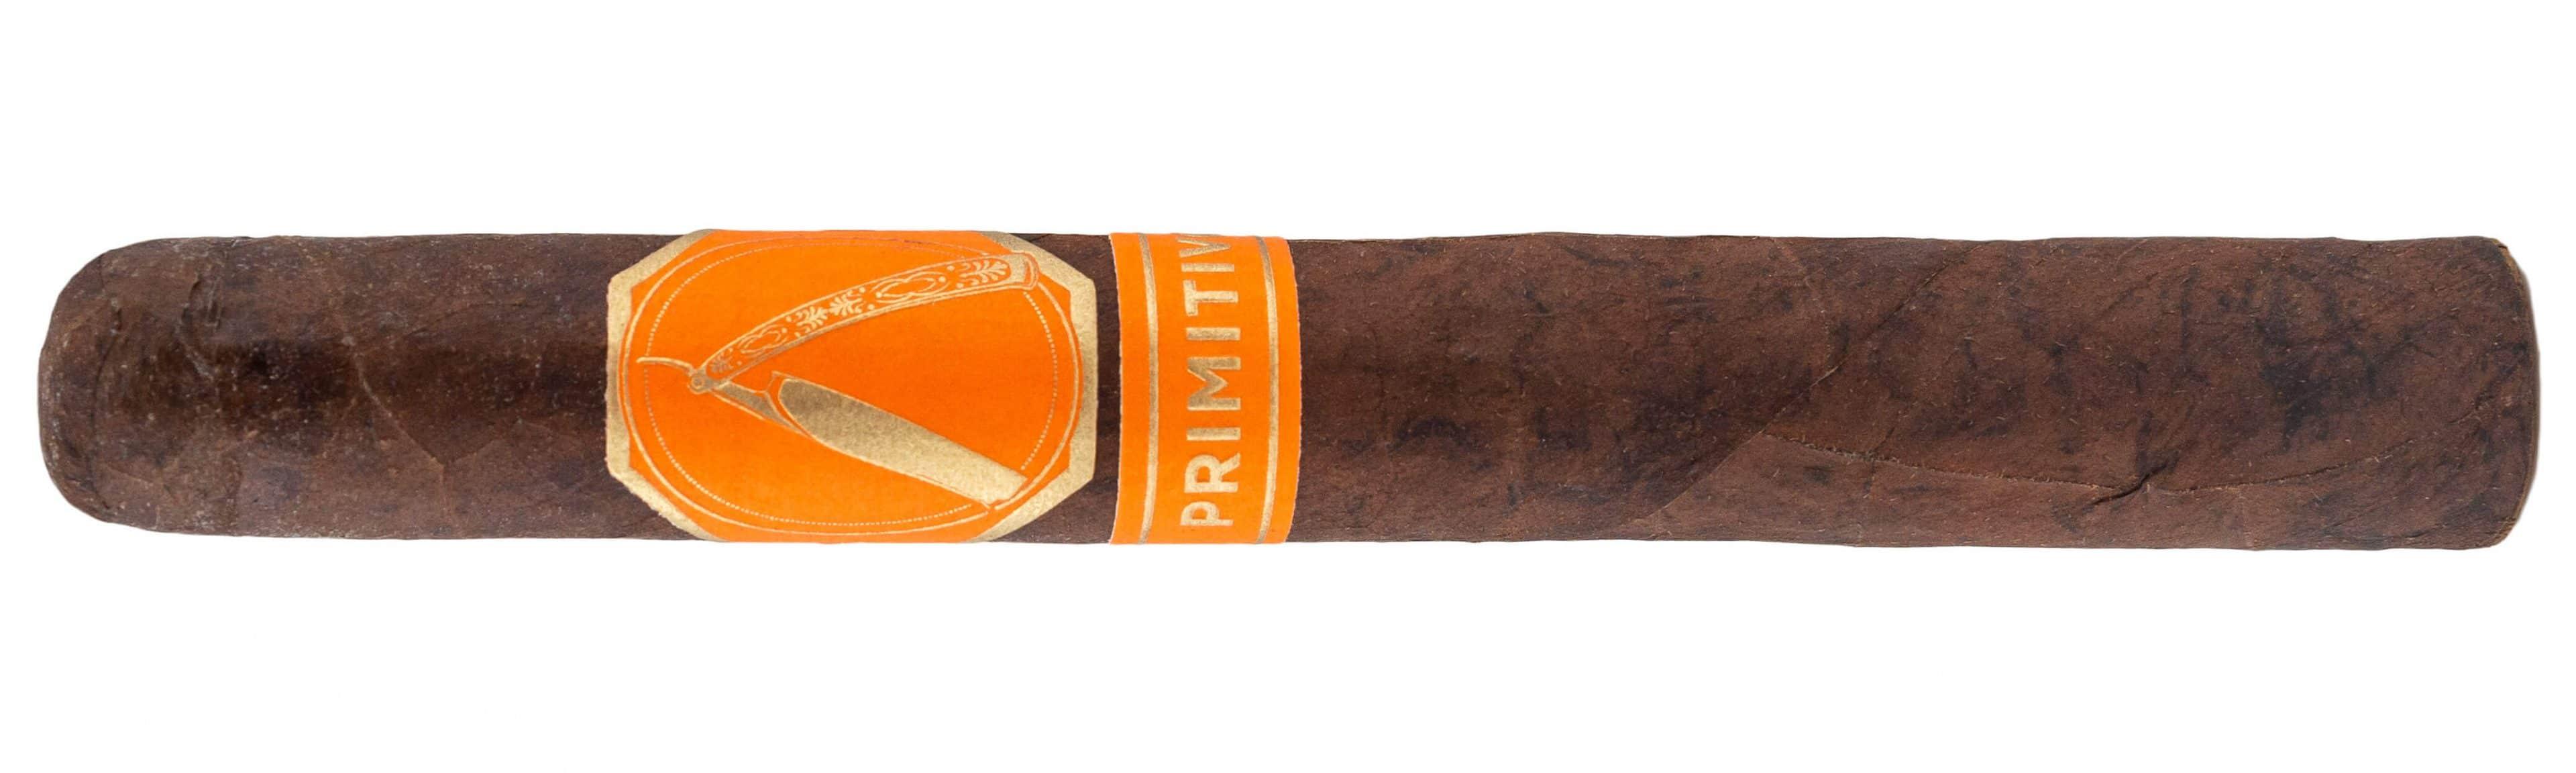 Blind Cigar Review: La Barba | Ricochet (Primitivo) 5 3/4 x 46